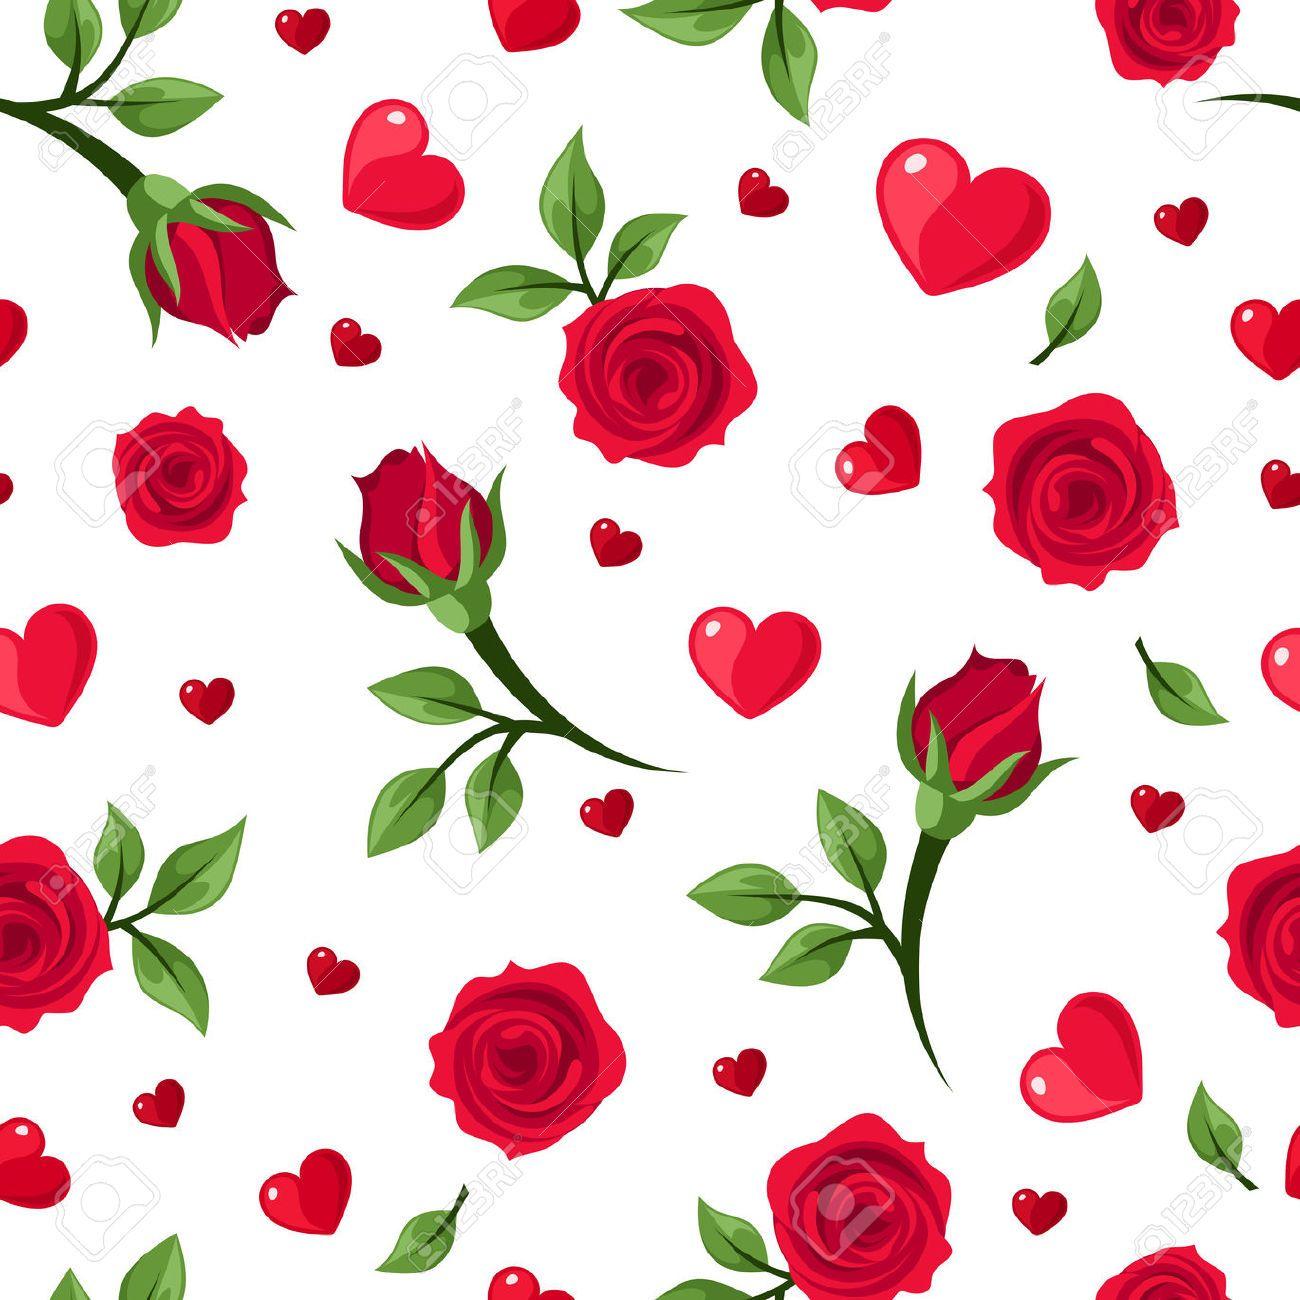 Red Roses Background Wallpaper Patterns Designs Designer Seamless